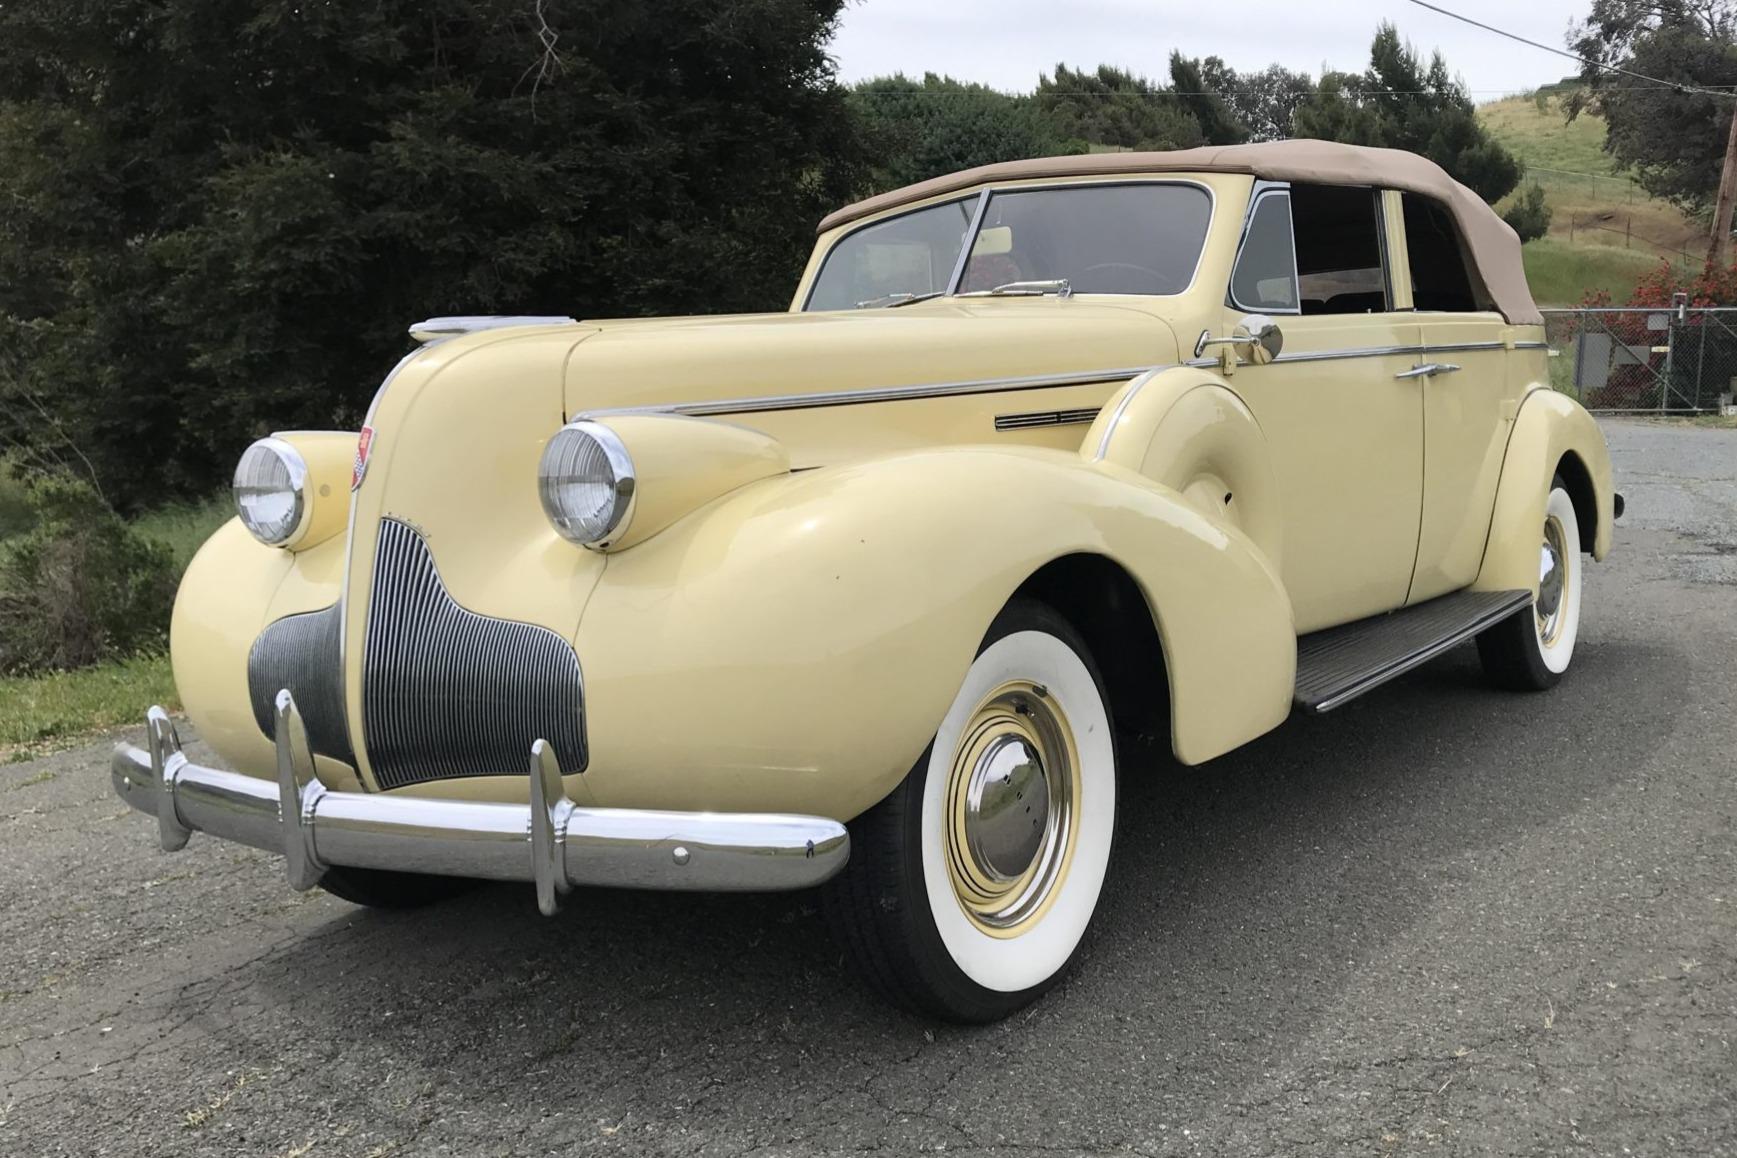 1939 Buick Roadmaster Phaeton Convertible 81-C 15